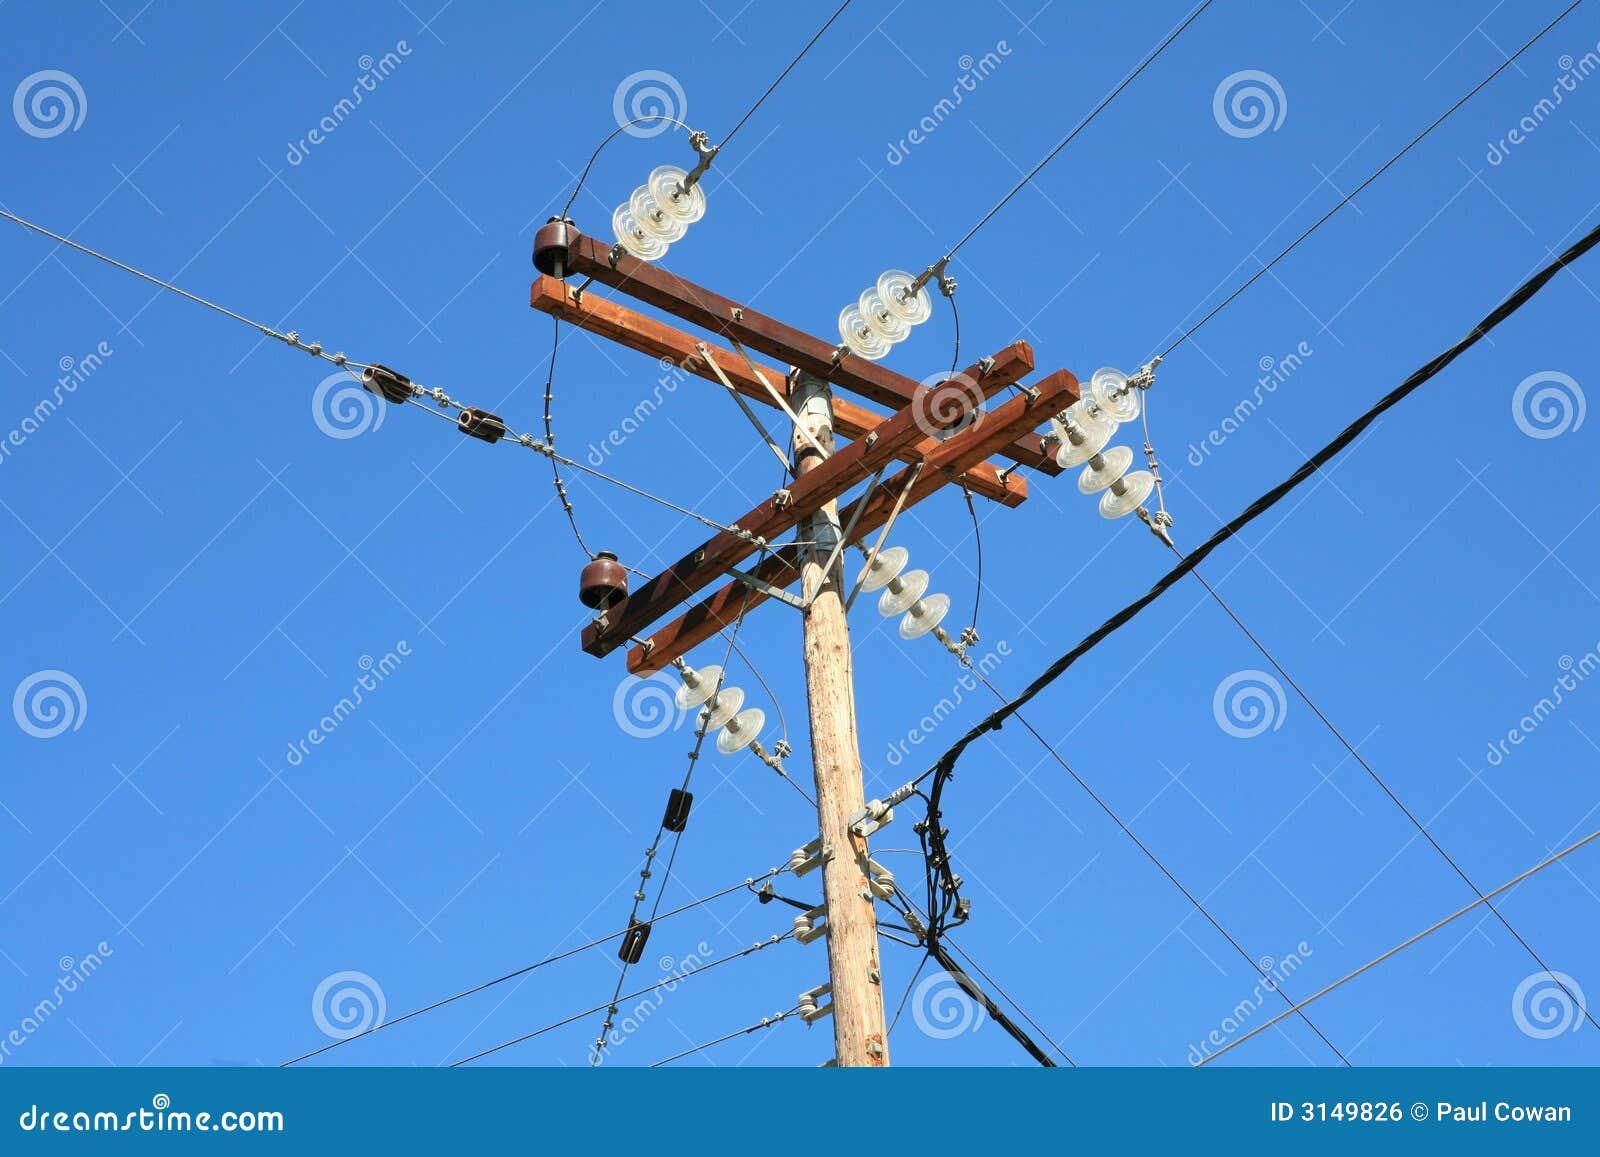 Linee elettriche ambientali